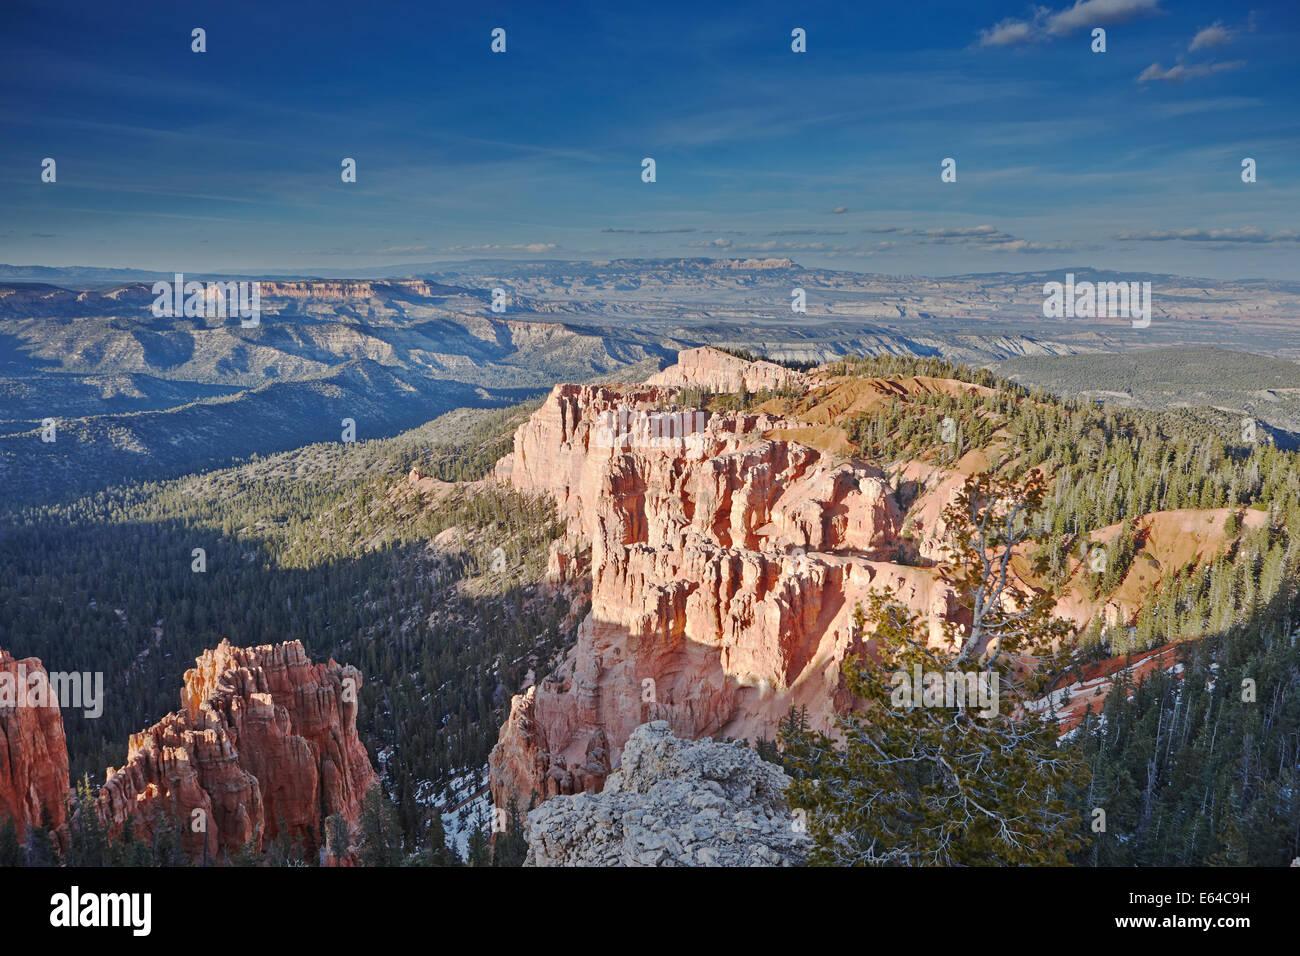 Rainbow Viewpoint. Bryce Canyon, Utah, USA. - Stock Image